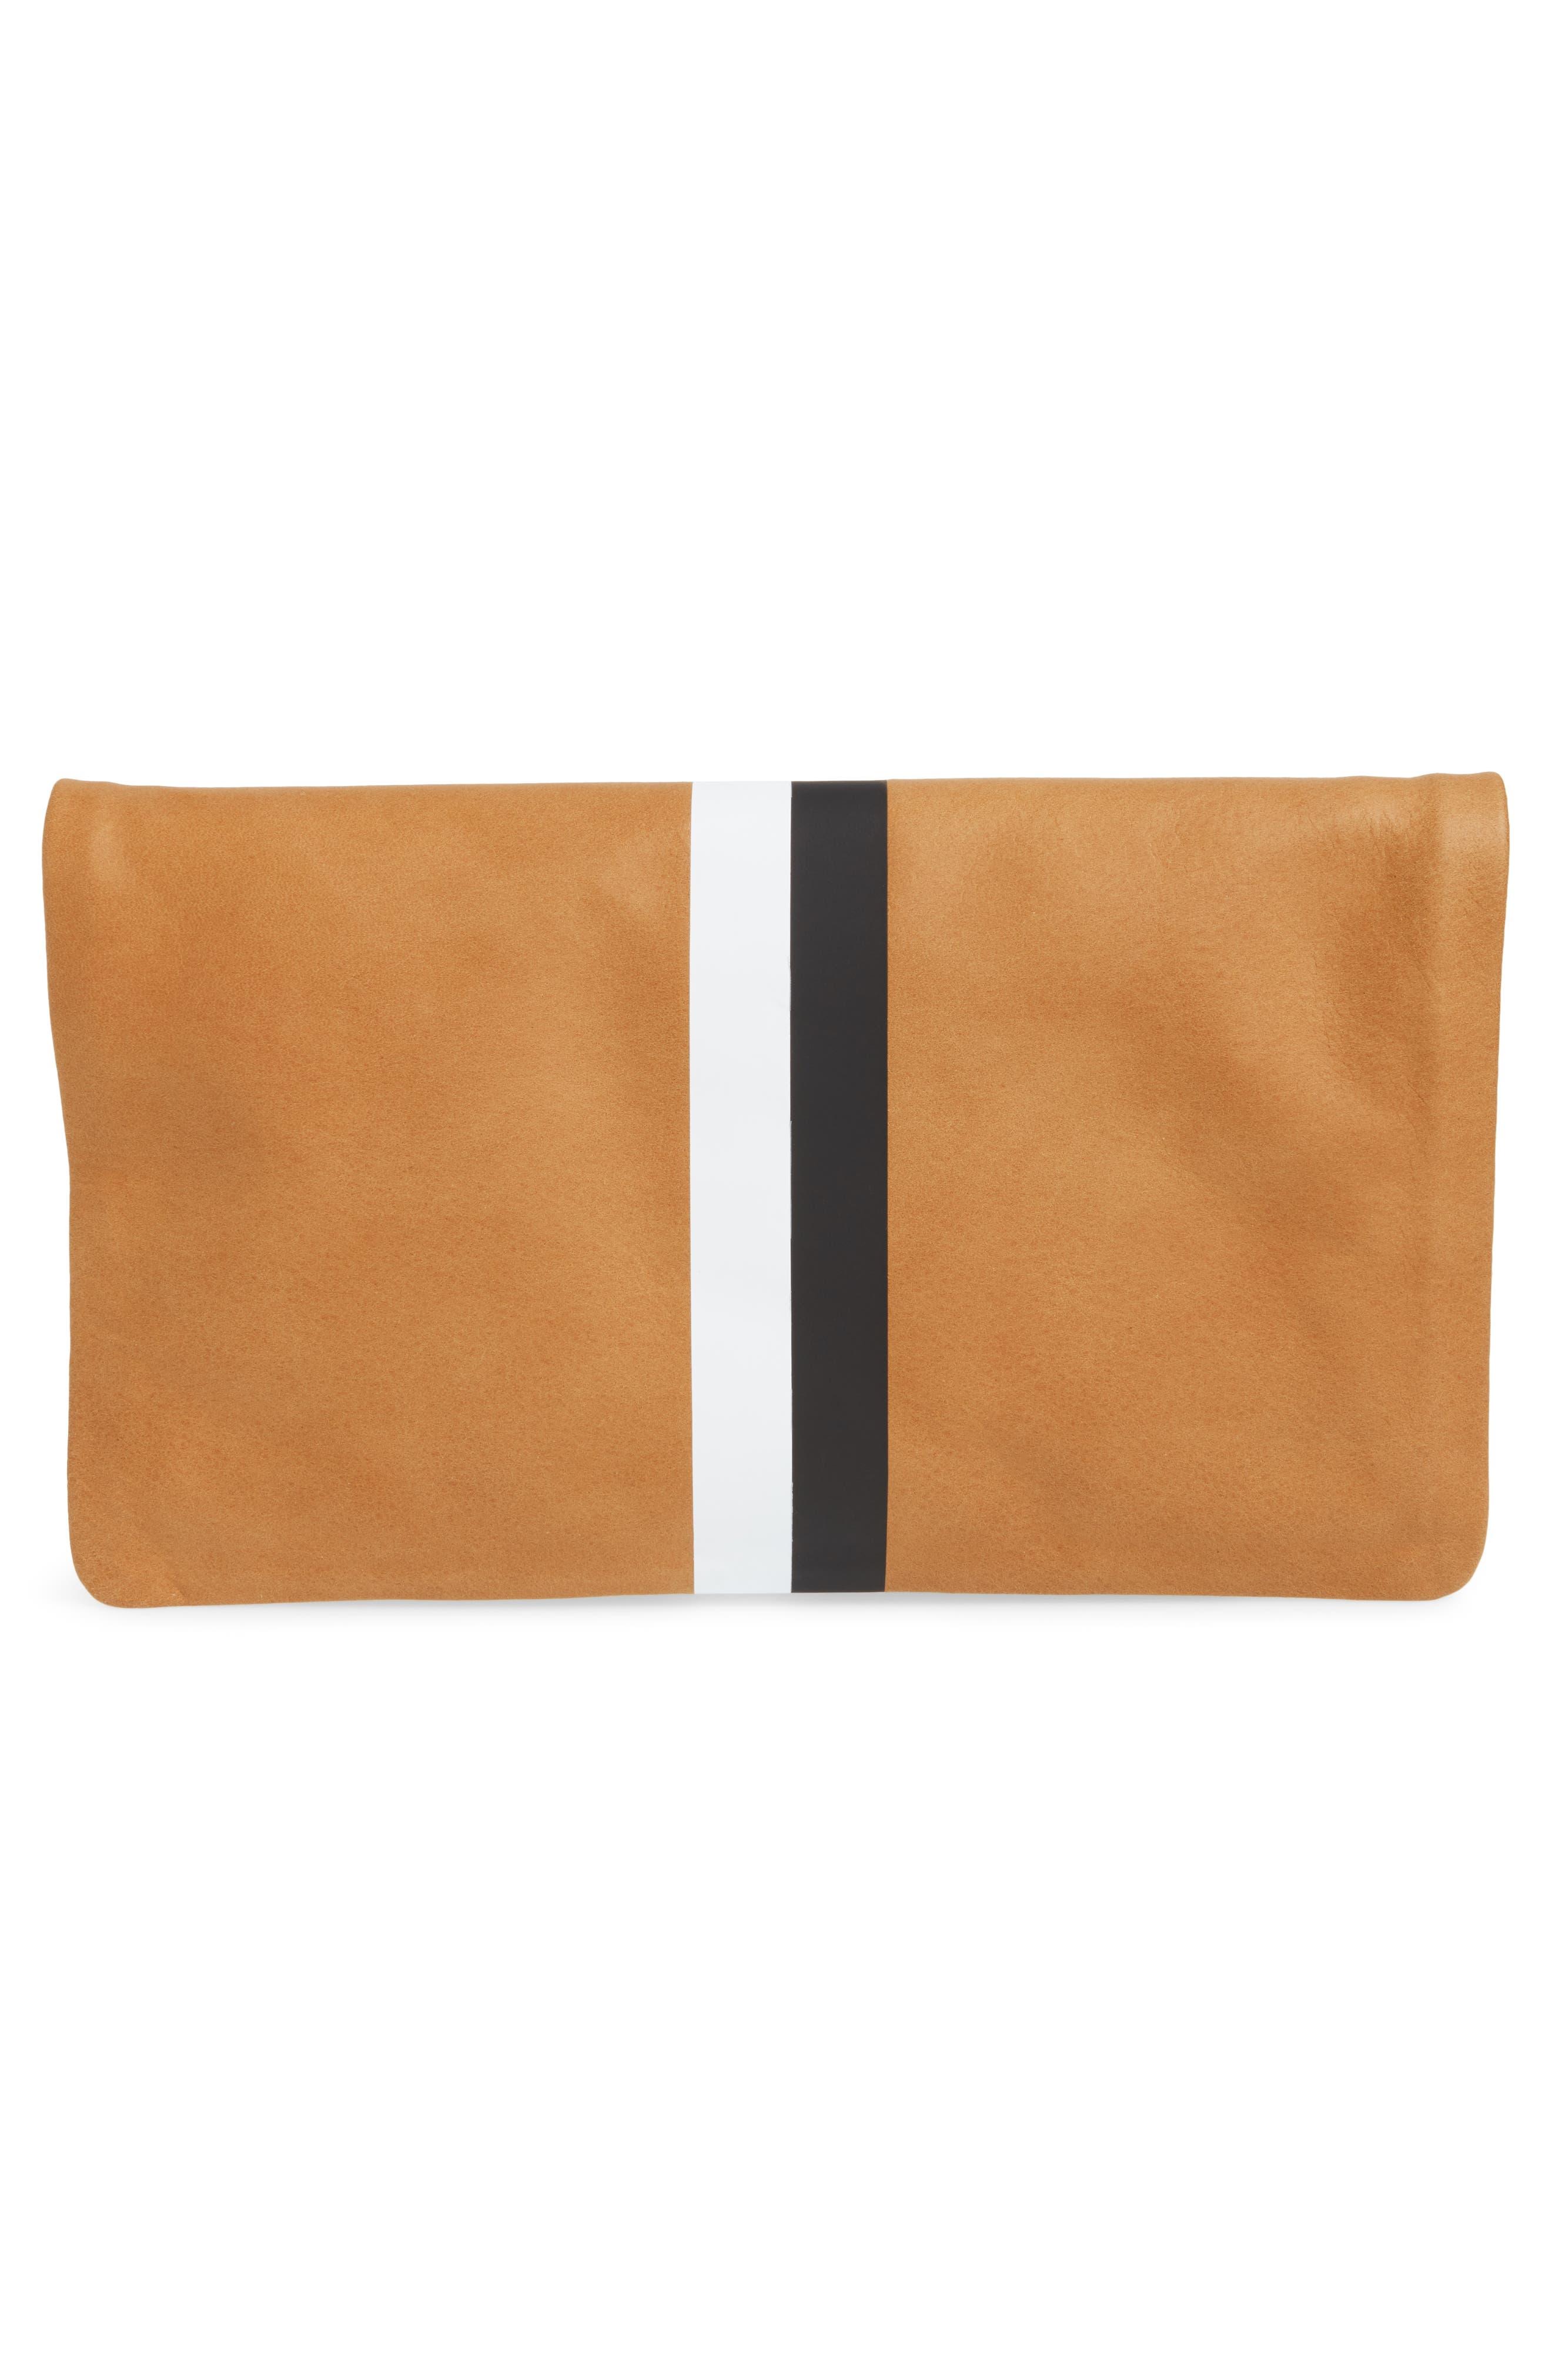 Center Stripe Leather Foldover Clutch,                             Alternate thumbnail 3, color,                             Nubuck Blck Whte Stripe